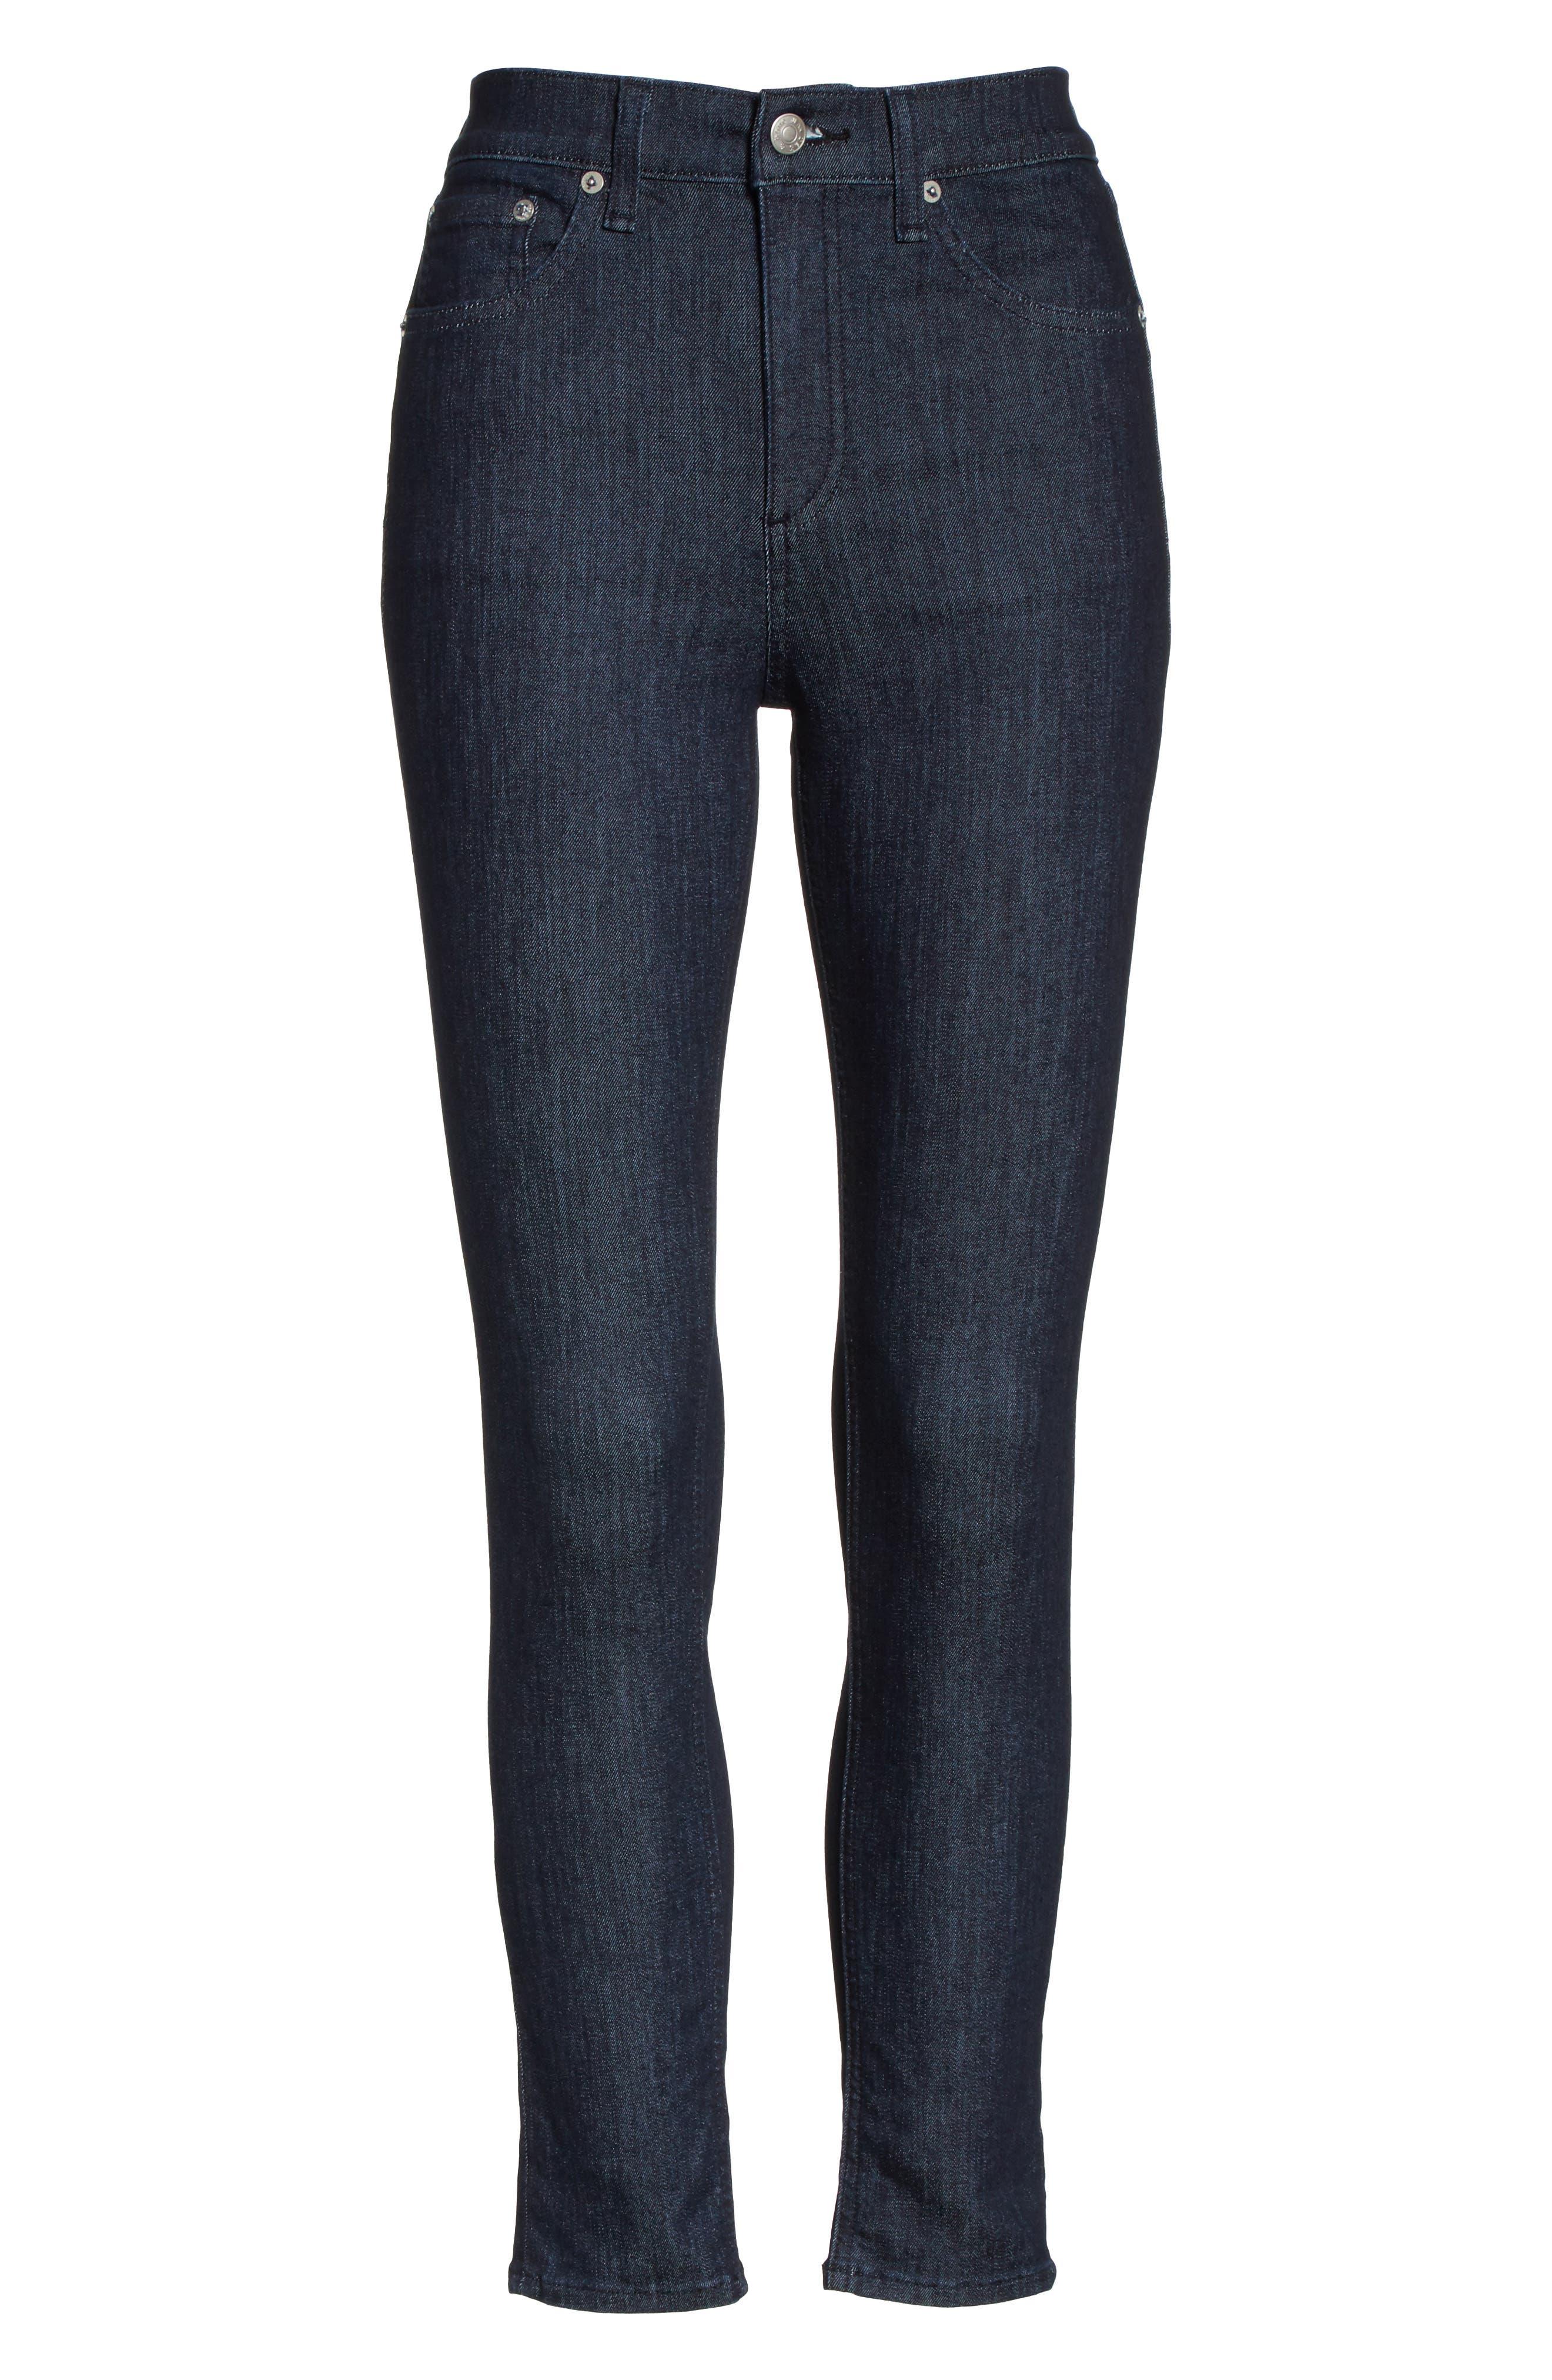 High Waist Skinny Jeans,                             Alternate thumbnail 7, color,                             INDIGO